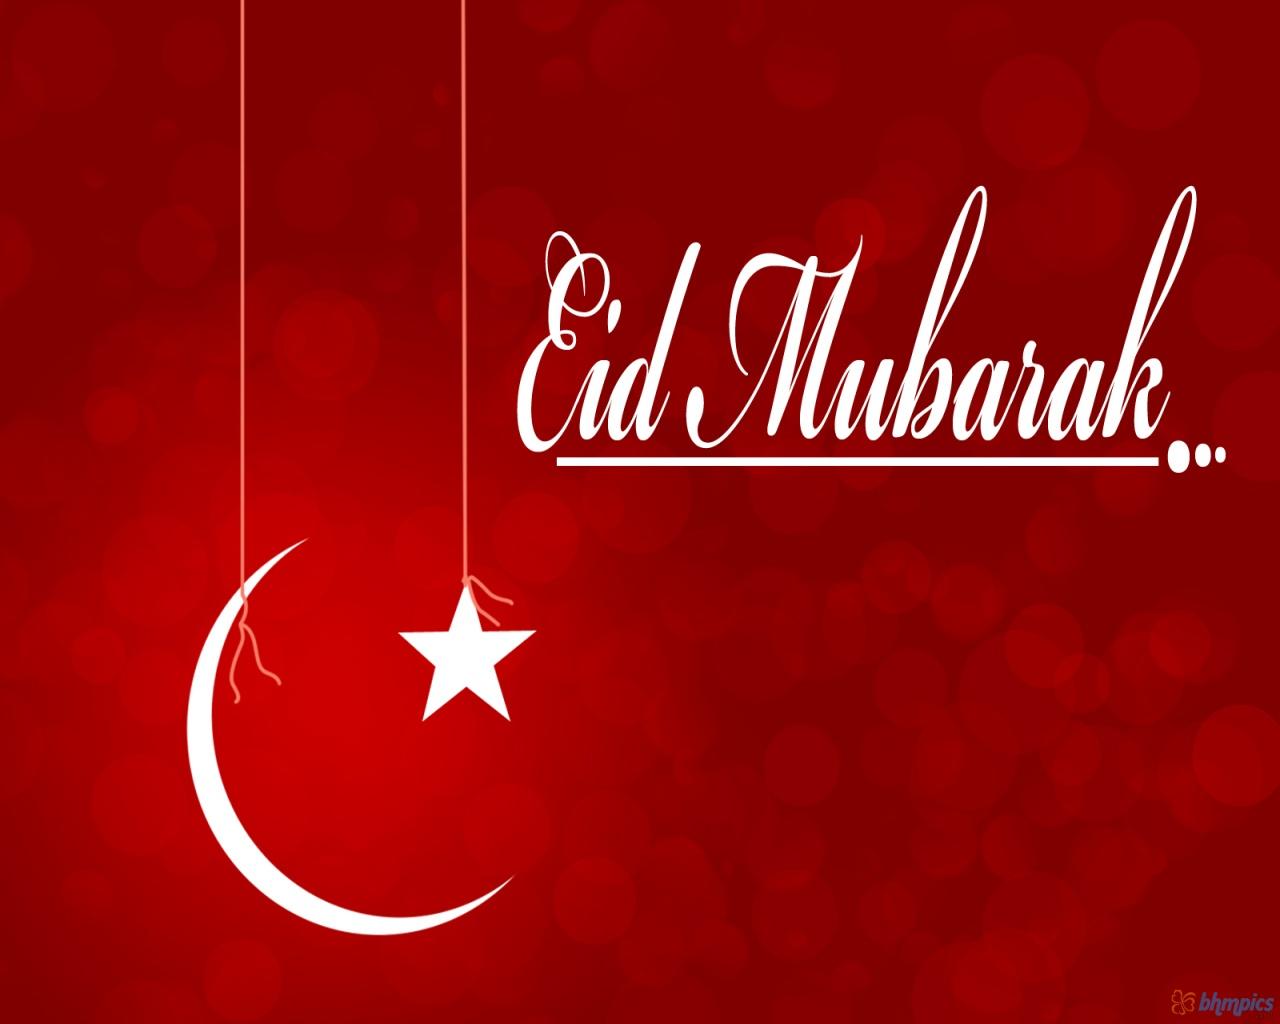 Ramadan 2015: Eid Mubarak Images